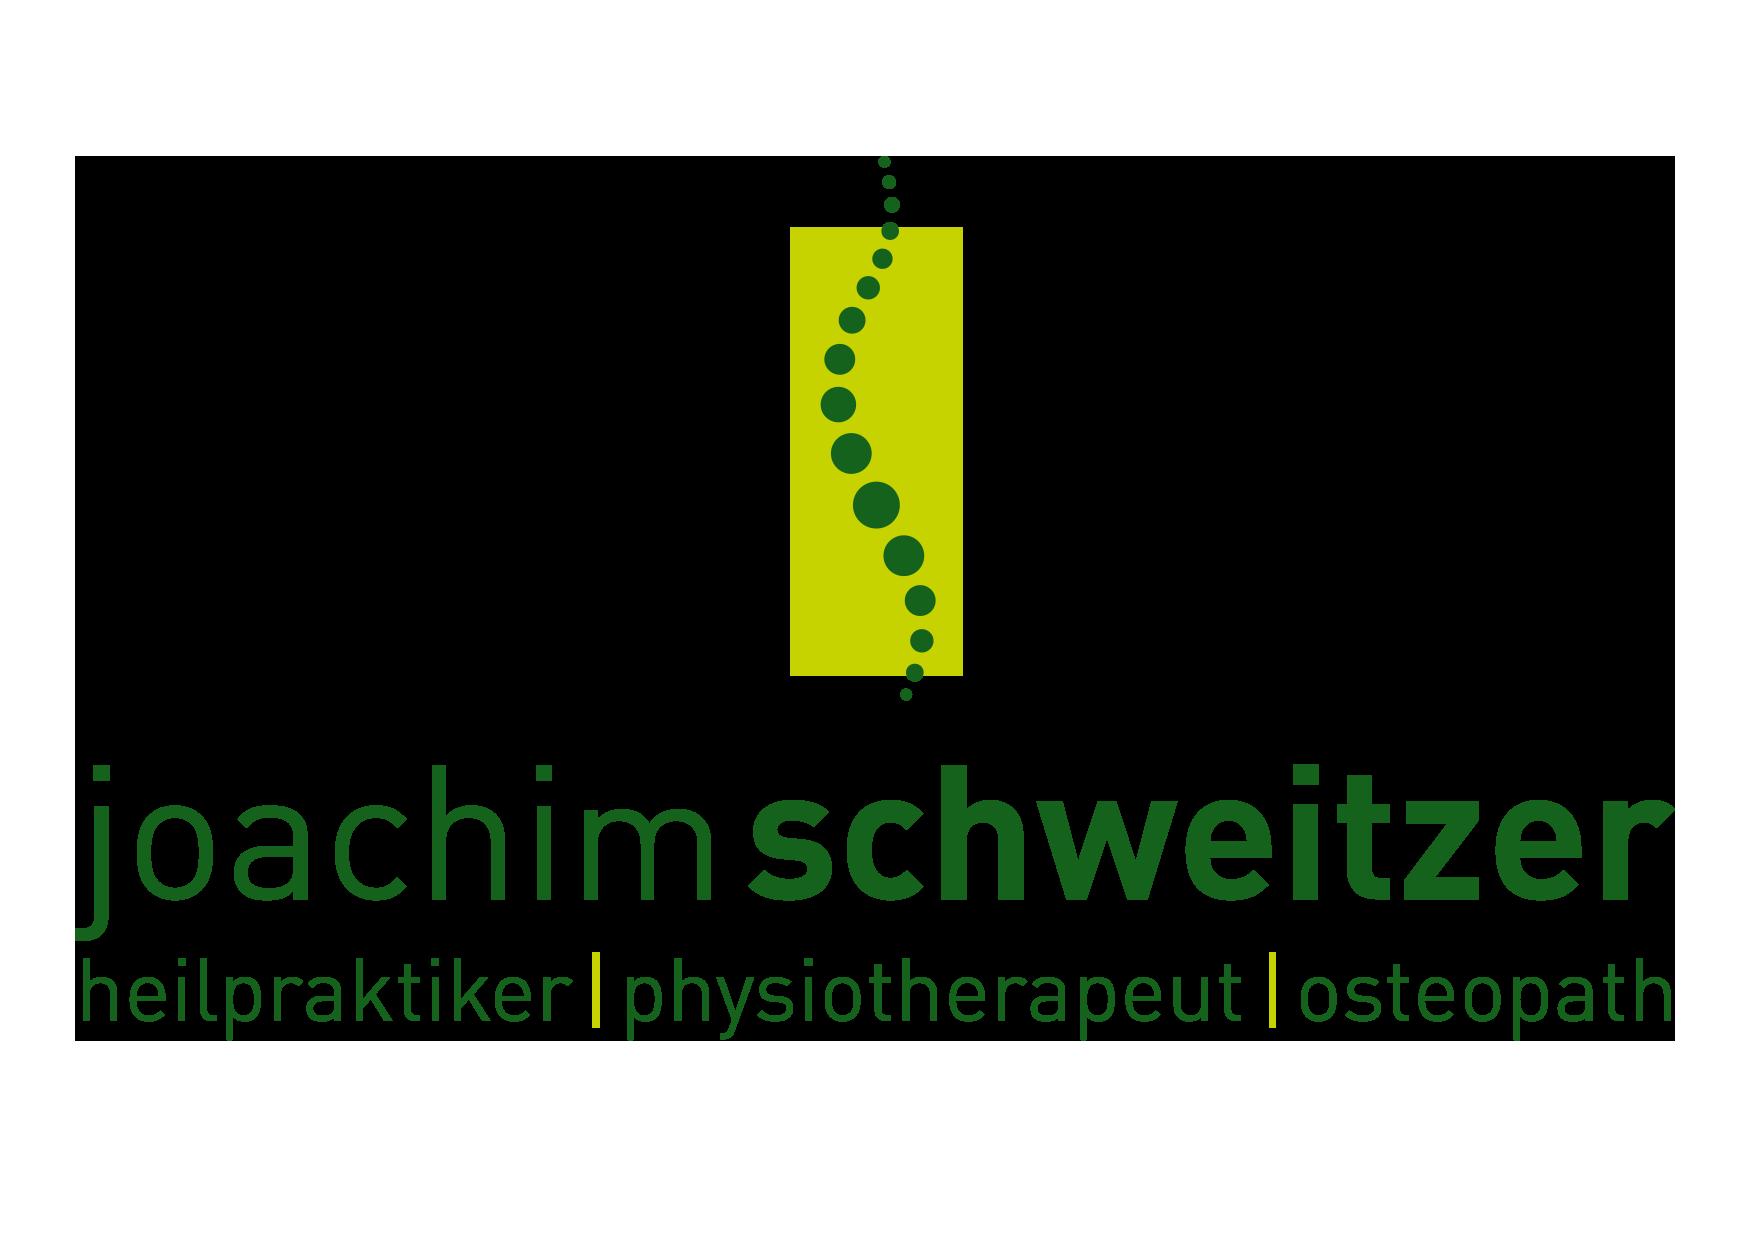 Joachim Schweitzer Logo | Werbeagentur Ritter